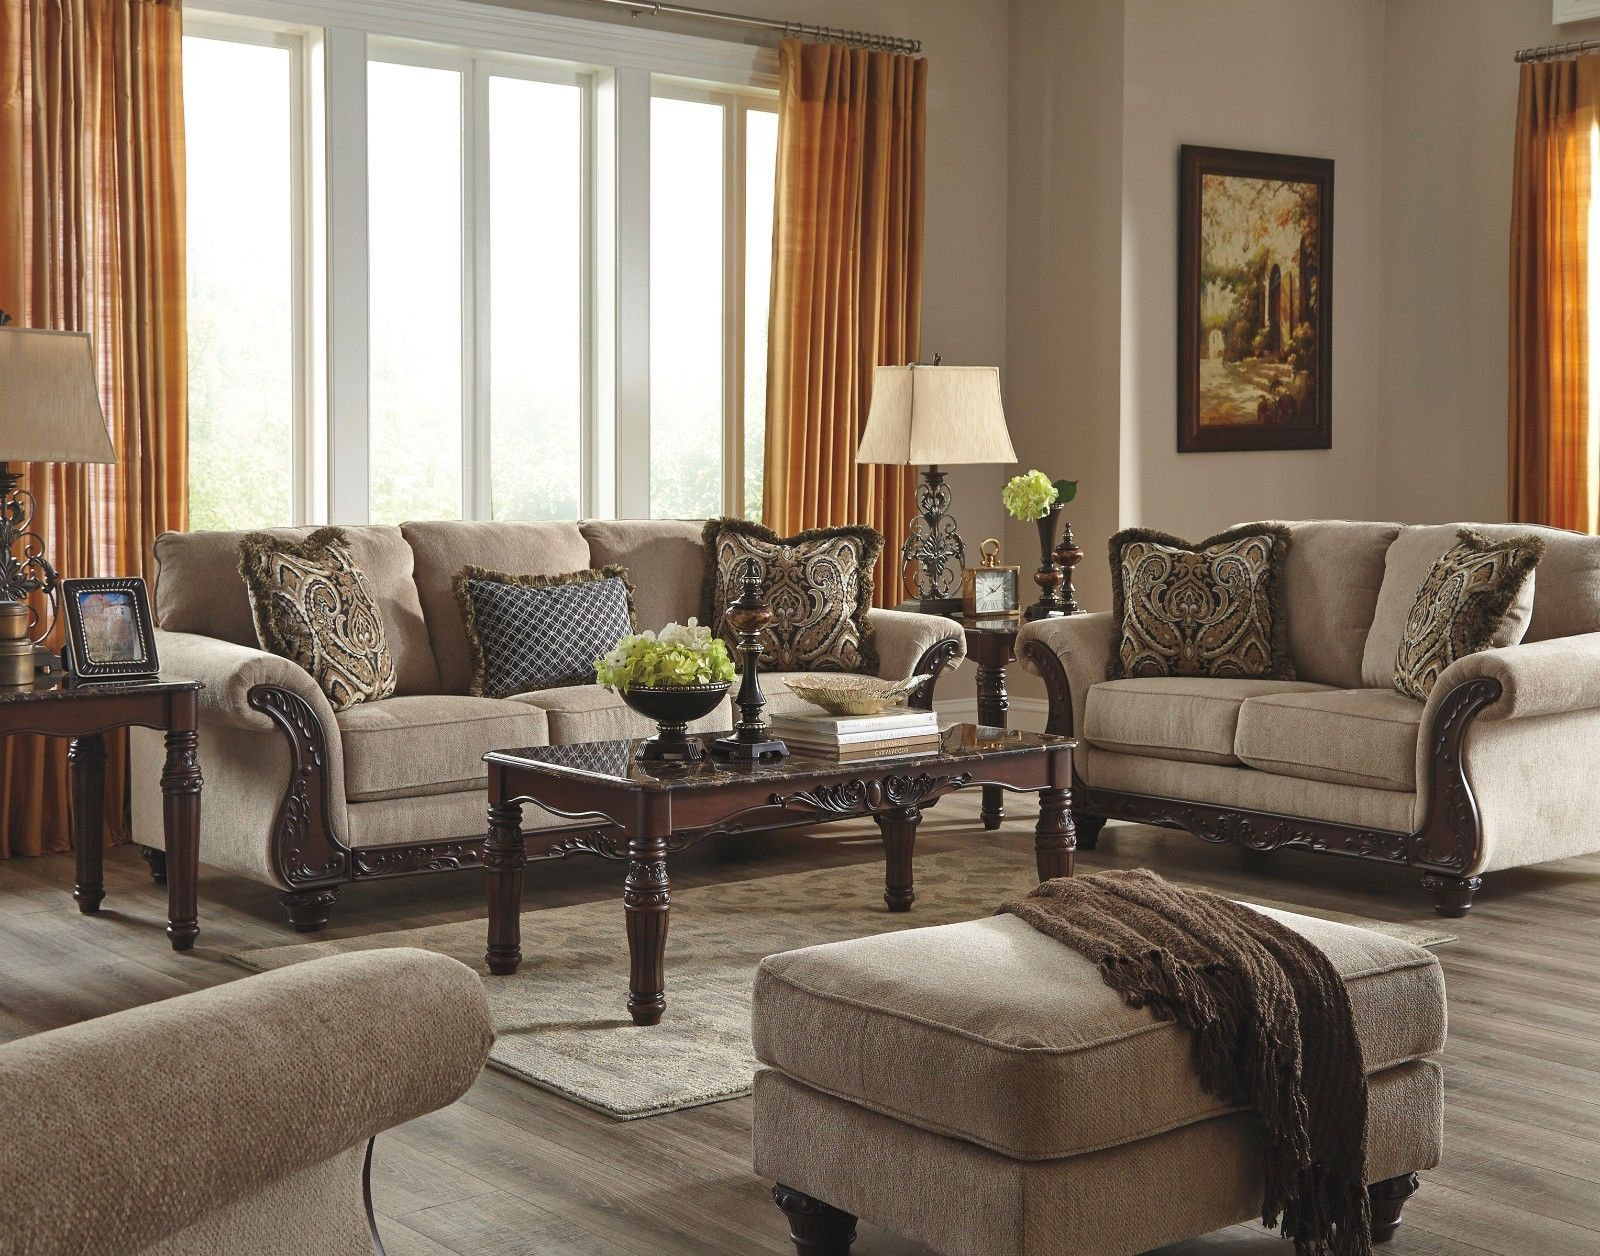 Ashley Laytonsville Pebble Sofa And Loveseat Furniture 72002 Ebay Living Room Sets Furniture Sofa And Loveseat Set